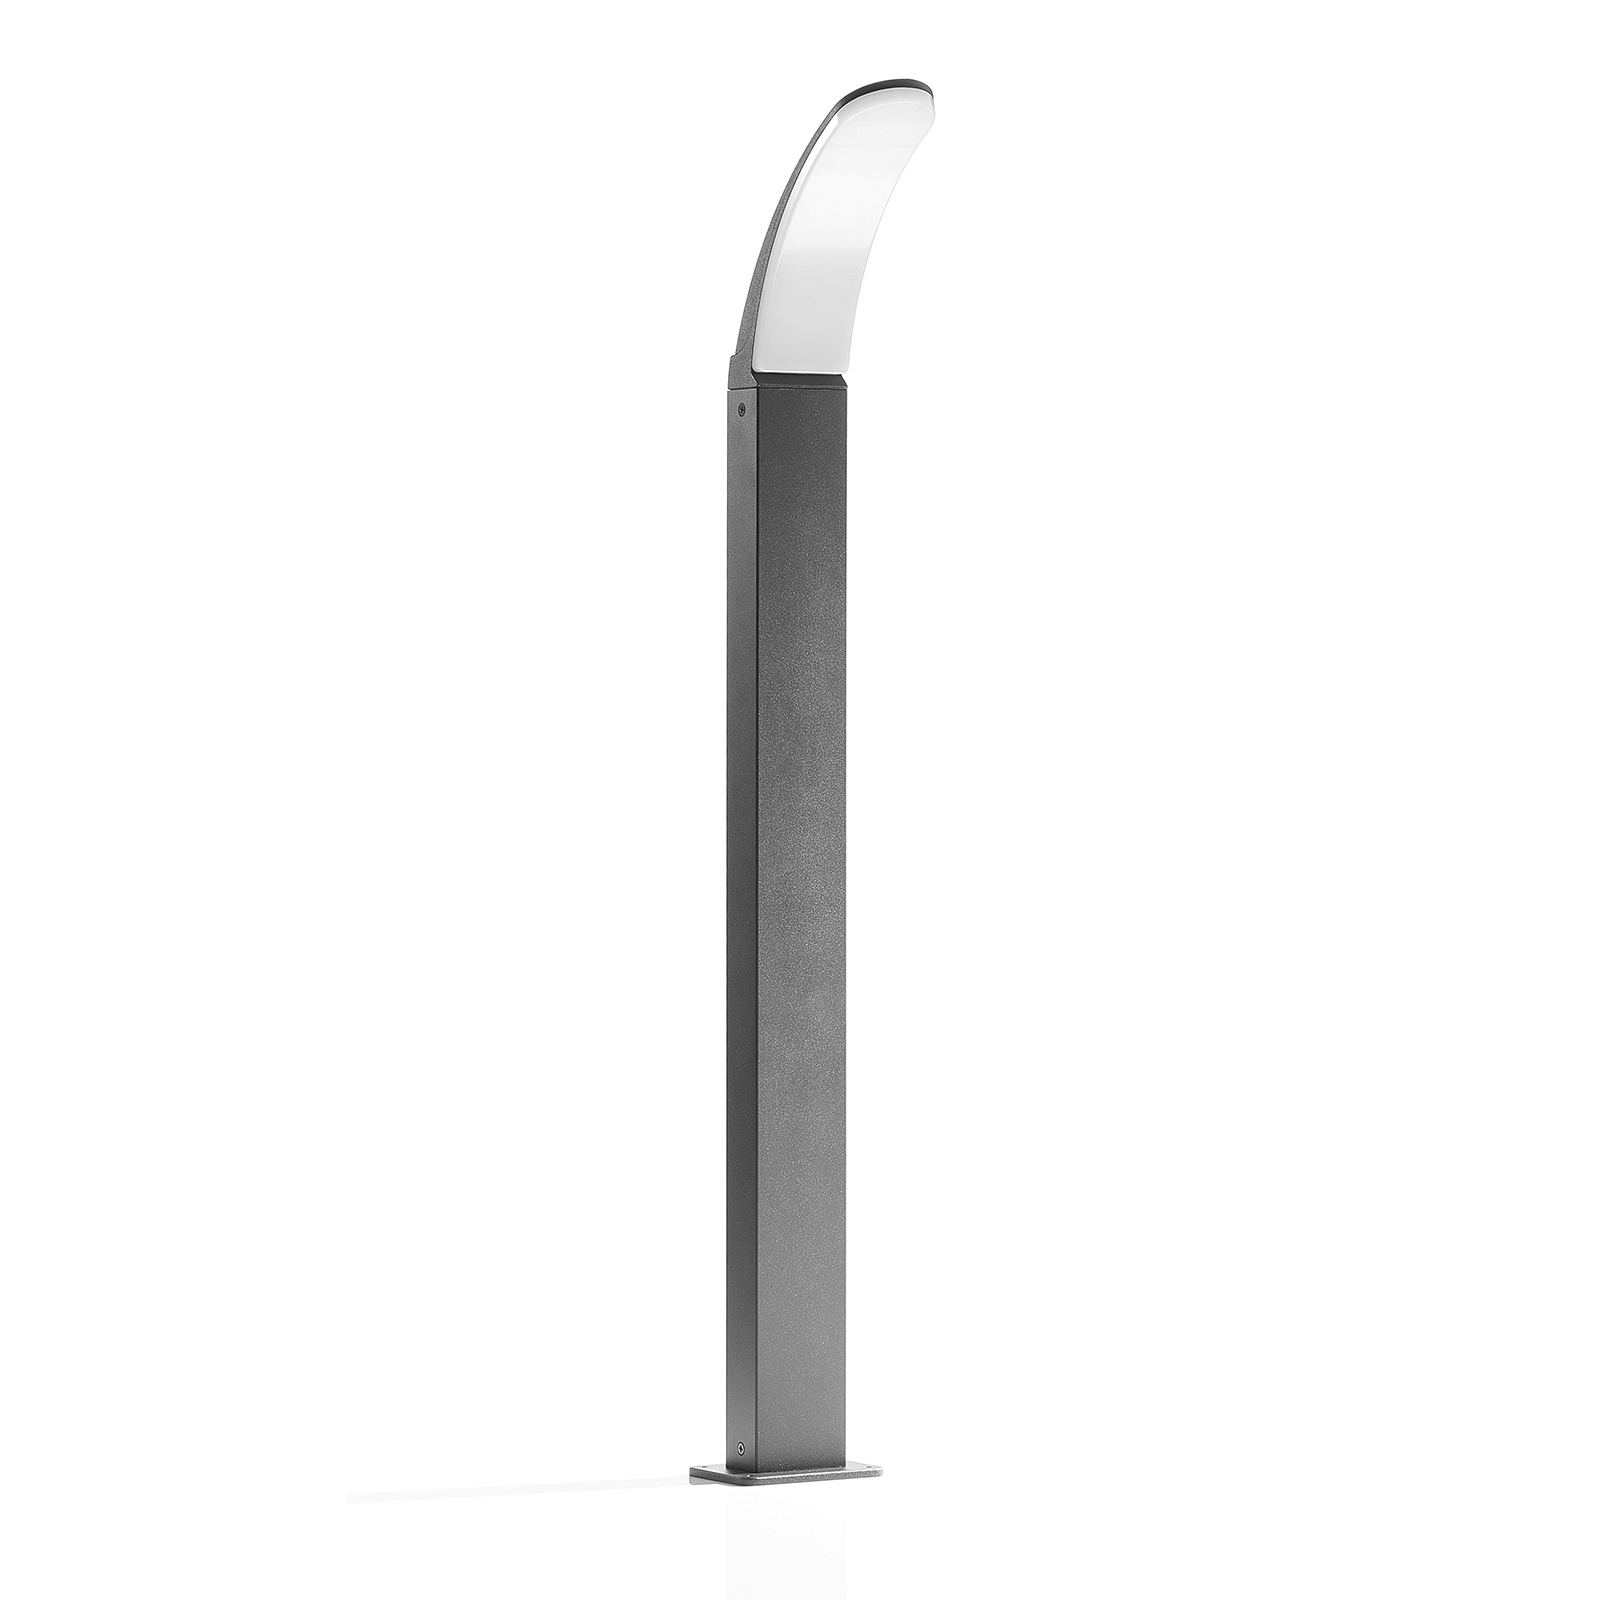 LED-Wegelampe Fiumicino in gebogener Form